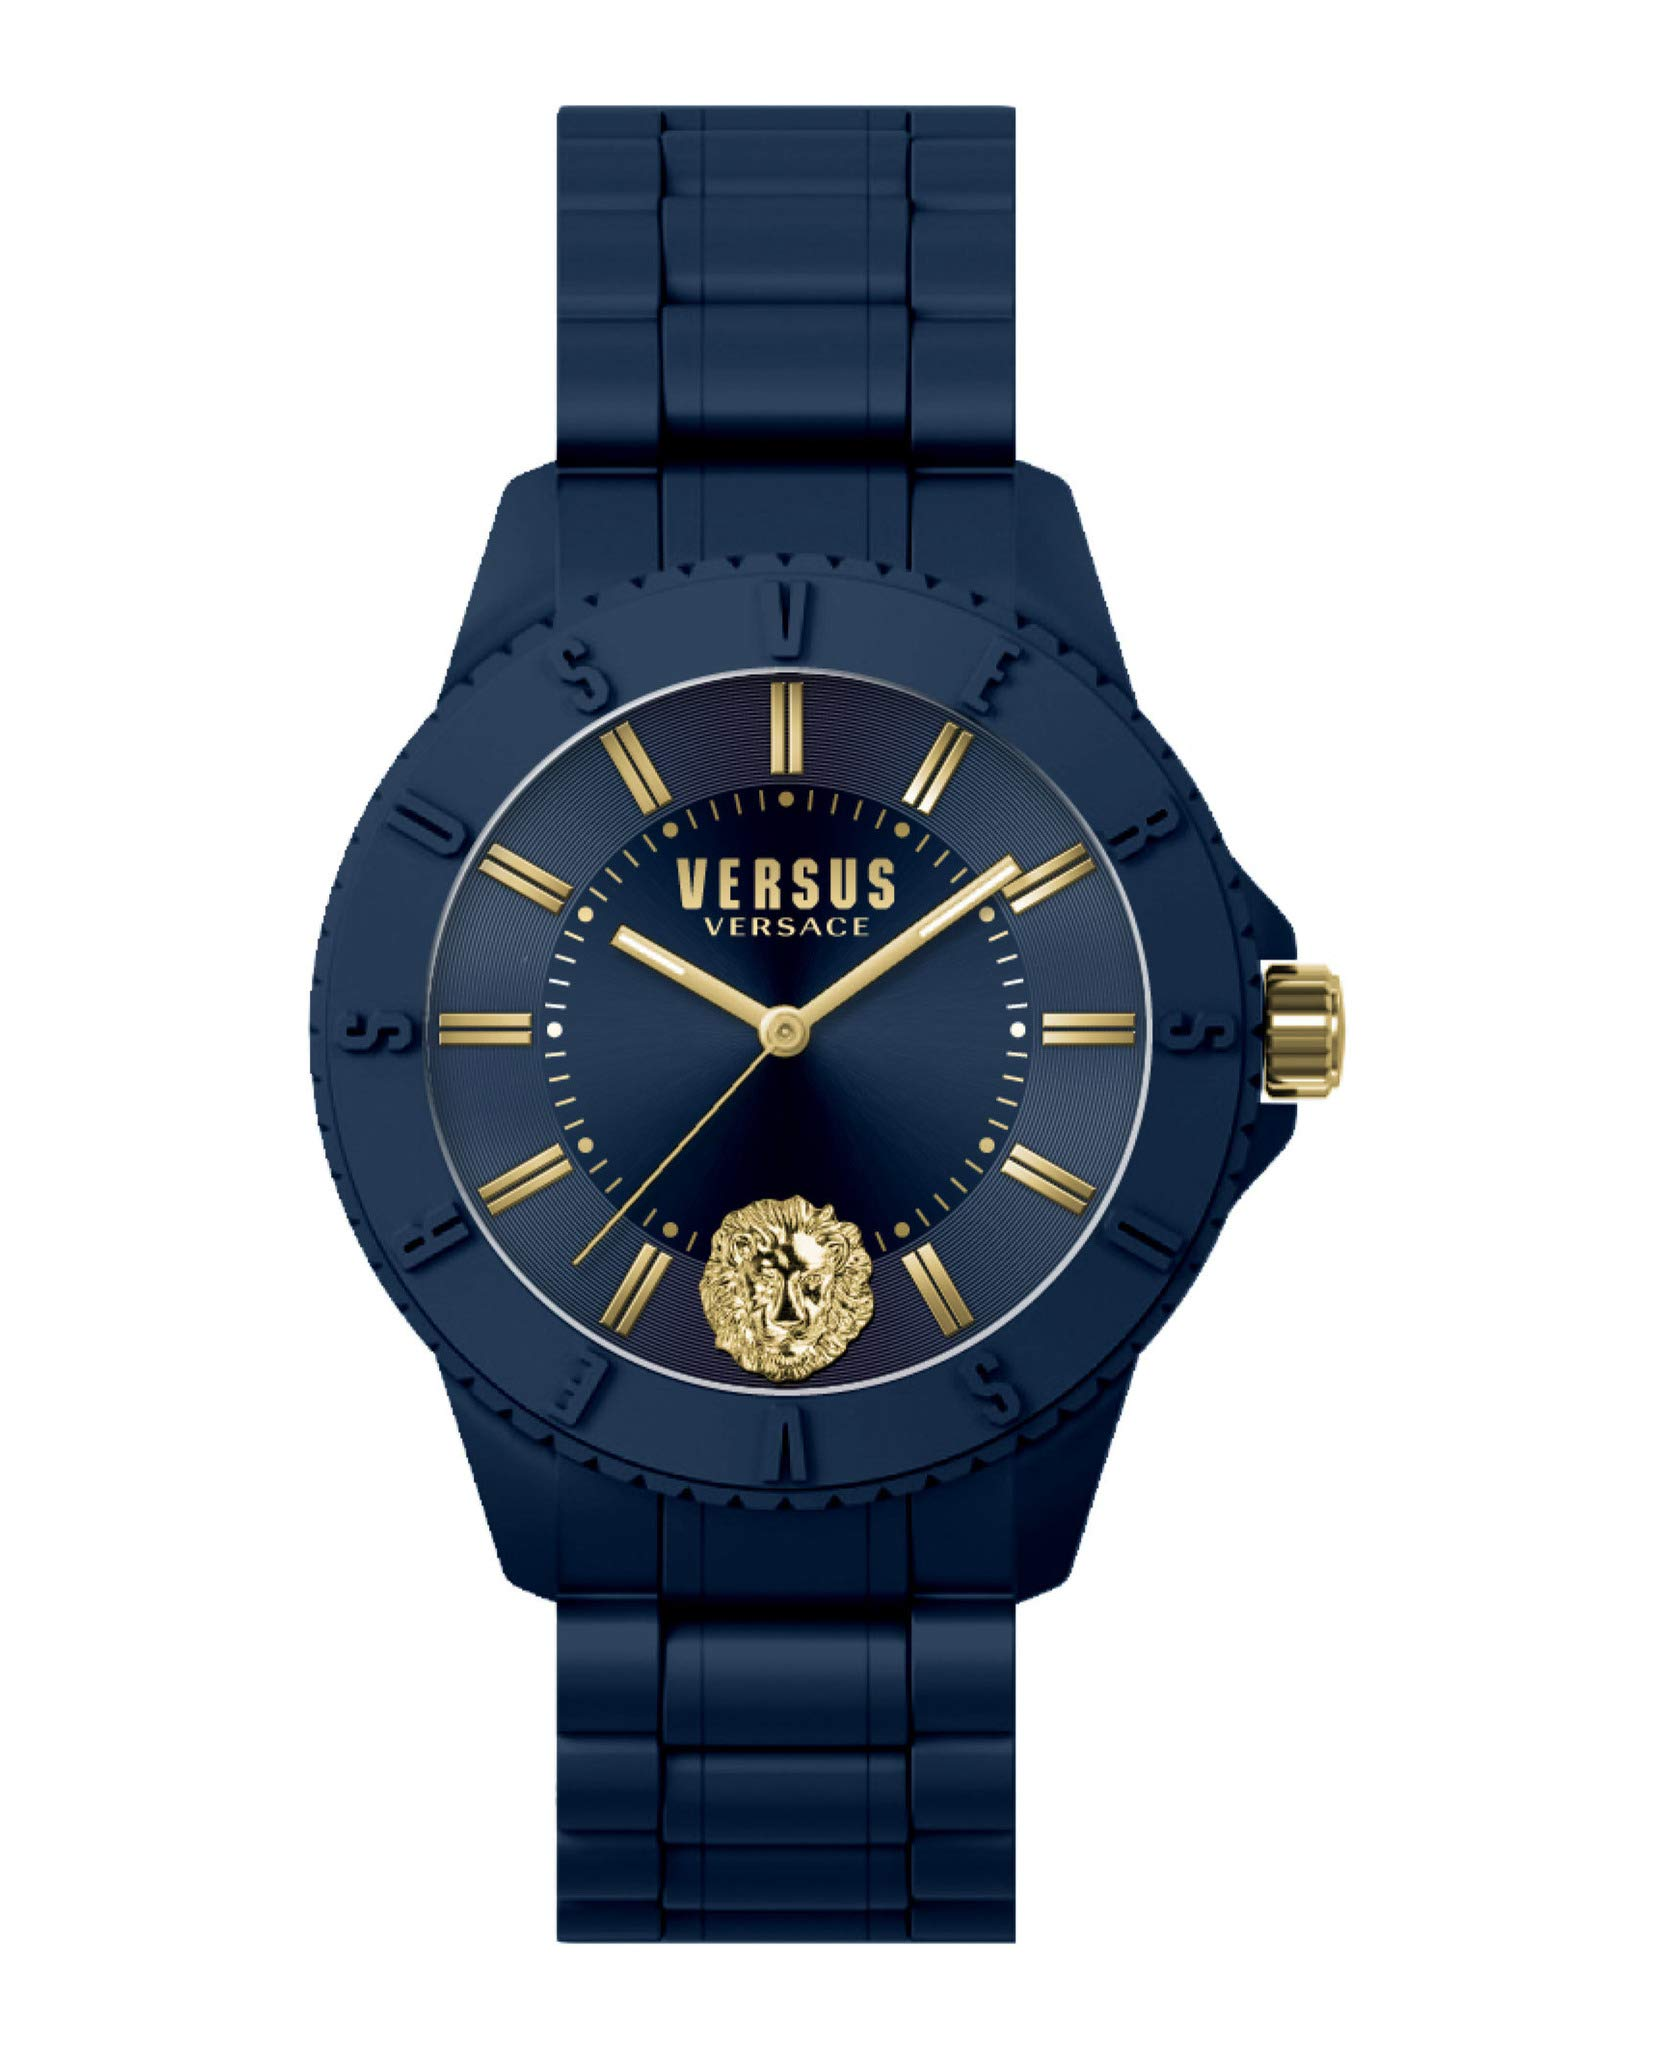 Versus Versace Unisex Tokyo R Watch VSPOY0418